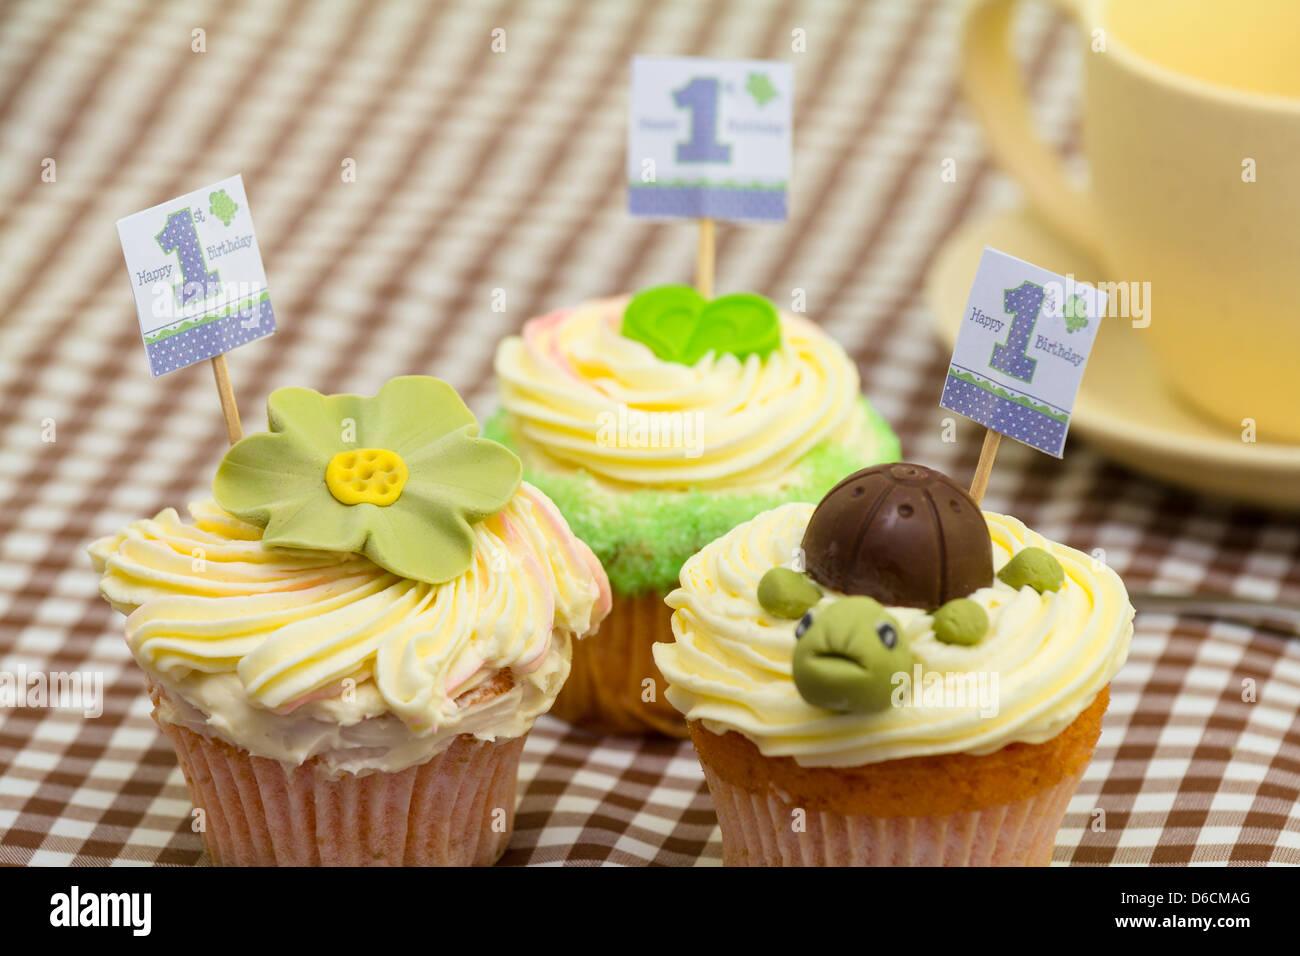 First Birthday Cakes Stock Photo 55598440